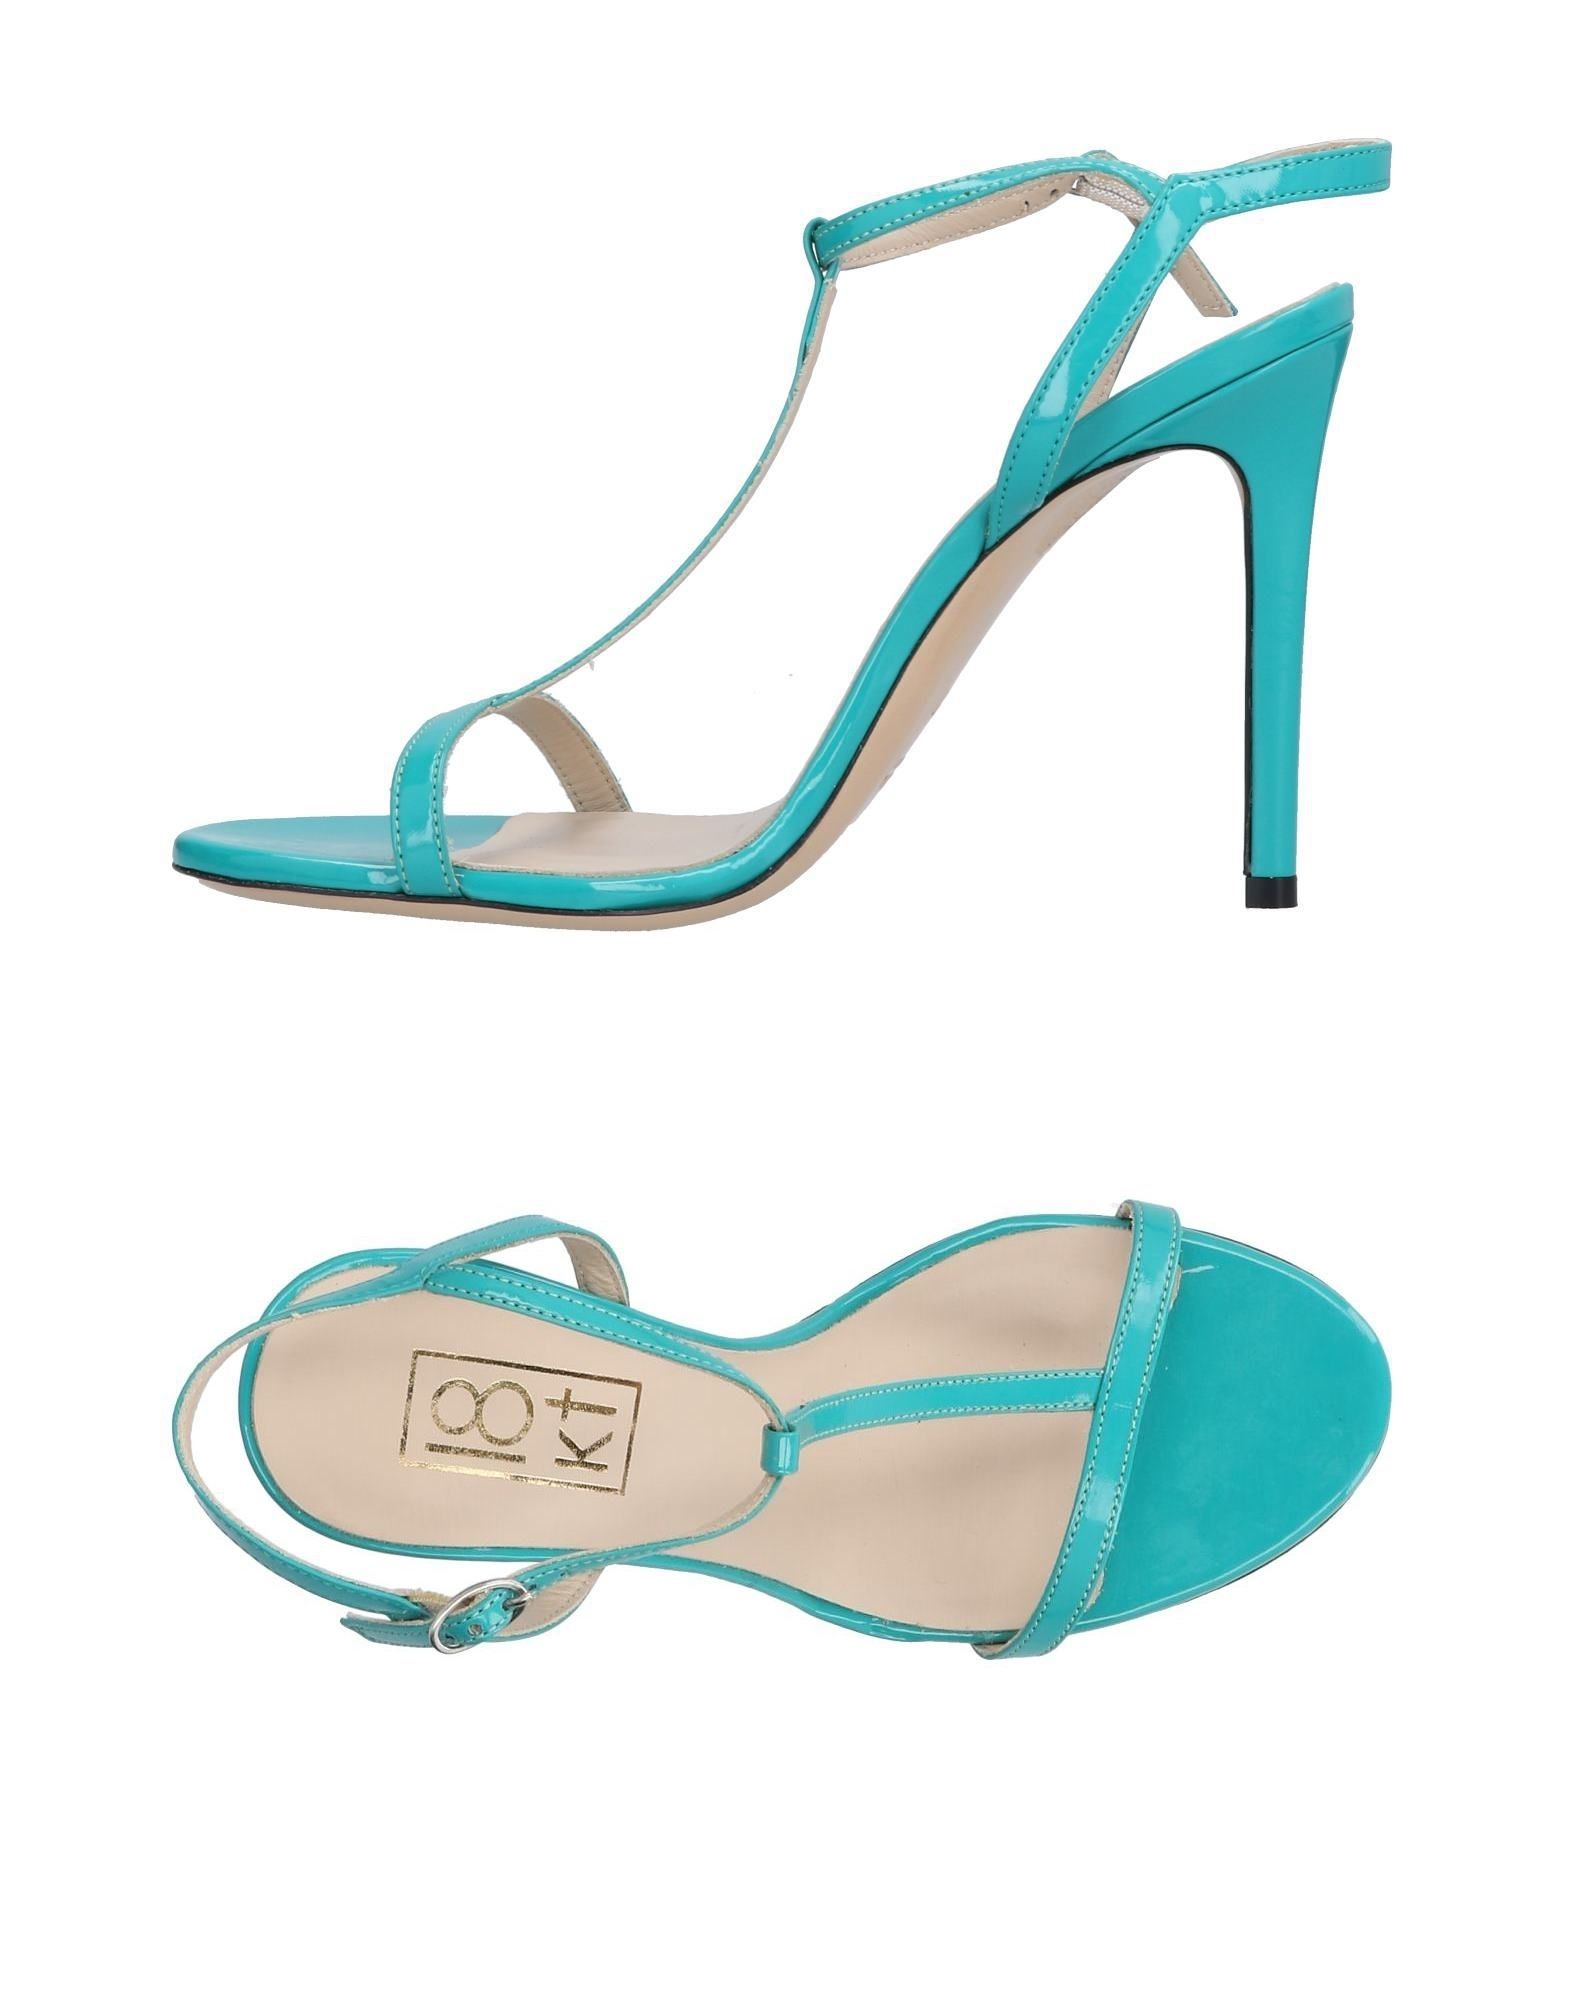 18 18 Kt Sandals - Women 18 18 Kt Sandals online on  Canada - 11500052HA 793bfa